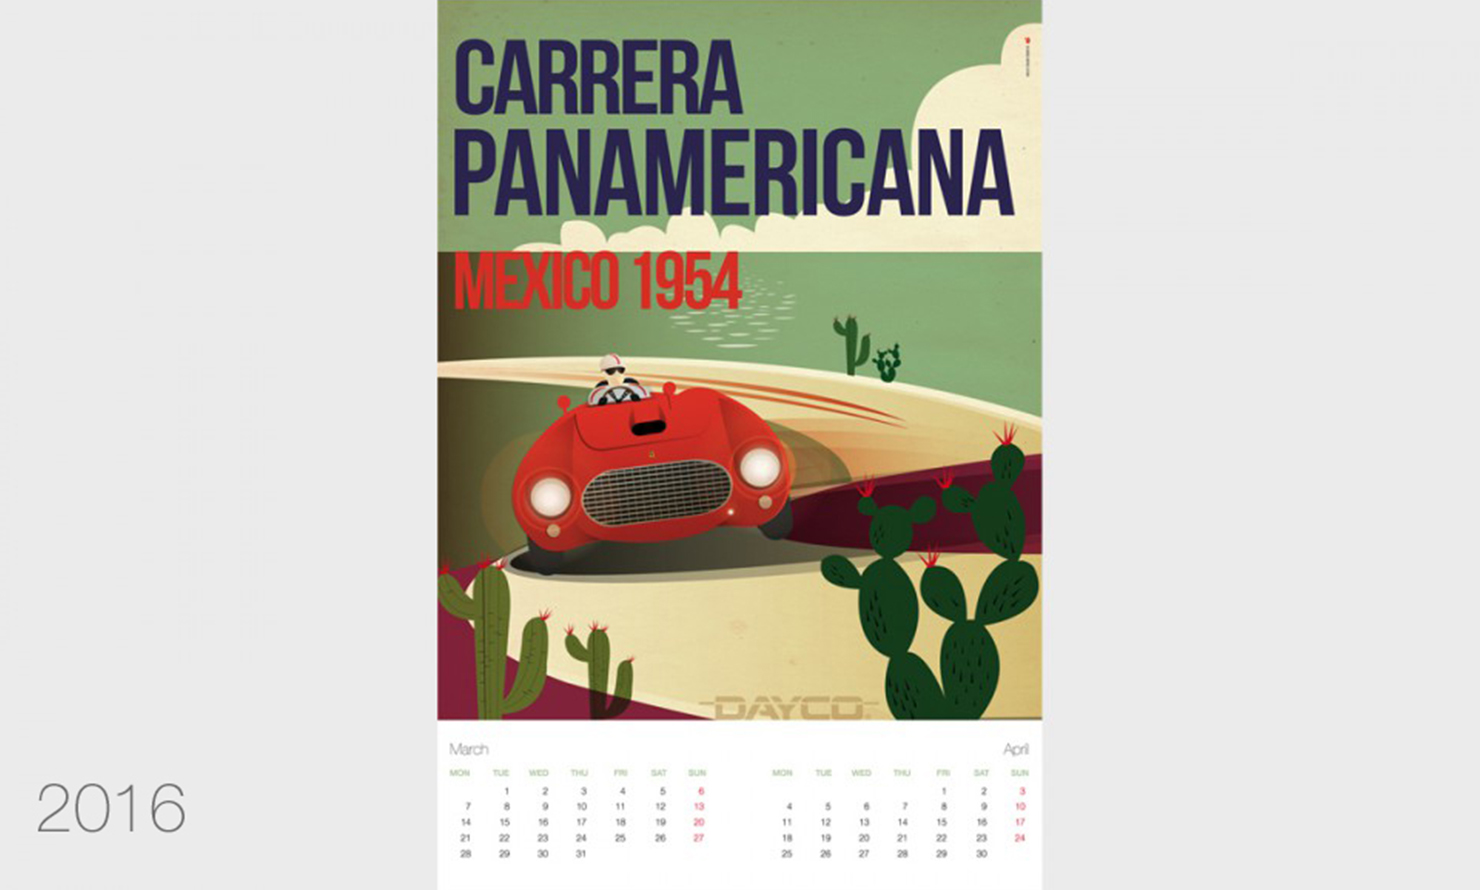 https://kubelibre.com/uploads/Slider-work-tutti-clienti/dayco-calendario-2016-2.jpg